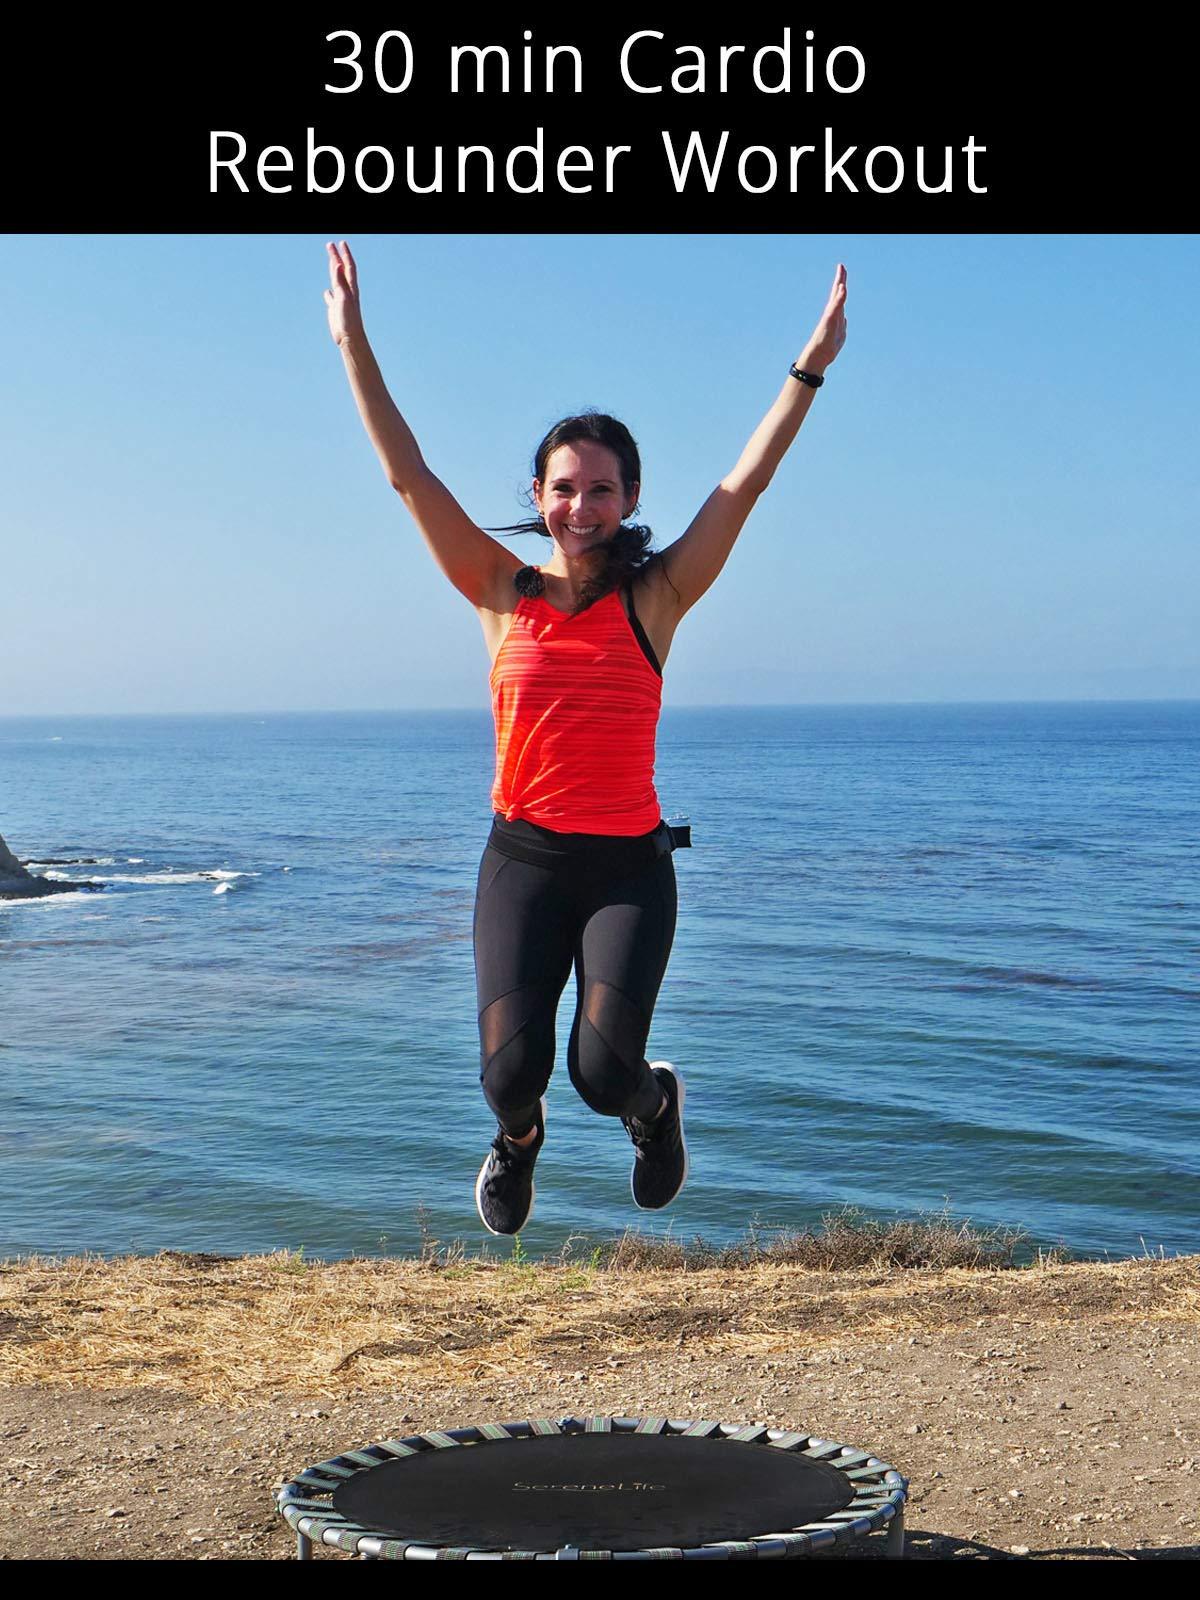 30 min Cardio Rebounder Workout